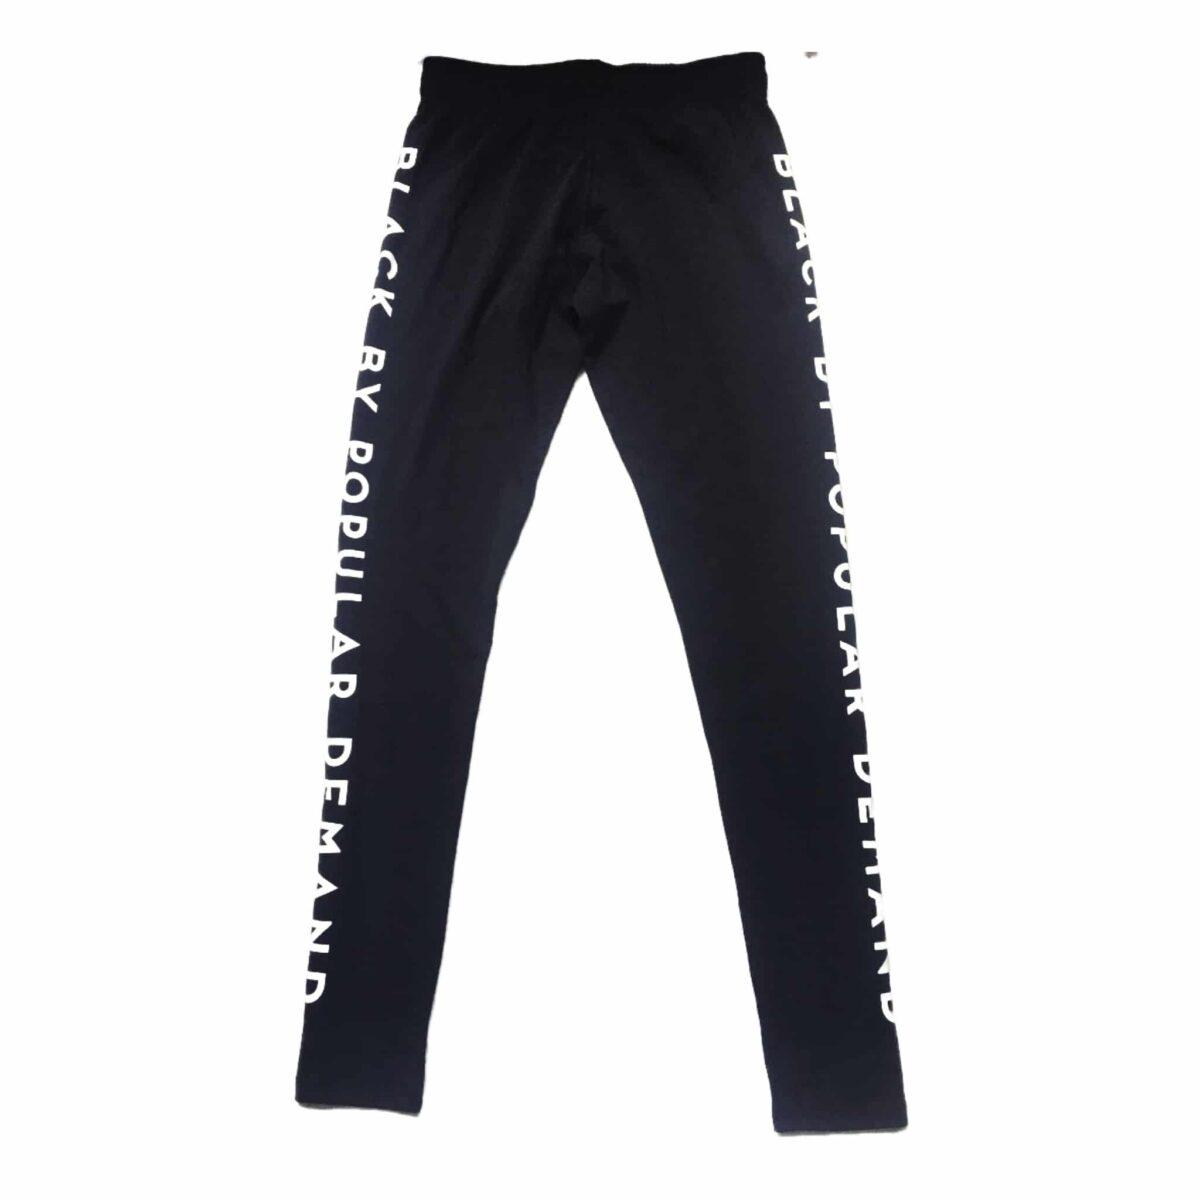 BLACK BY POPULAR DEMAND® Spandex Leggings Pants HGC Apparel